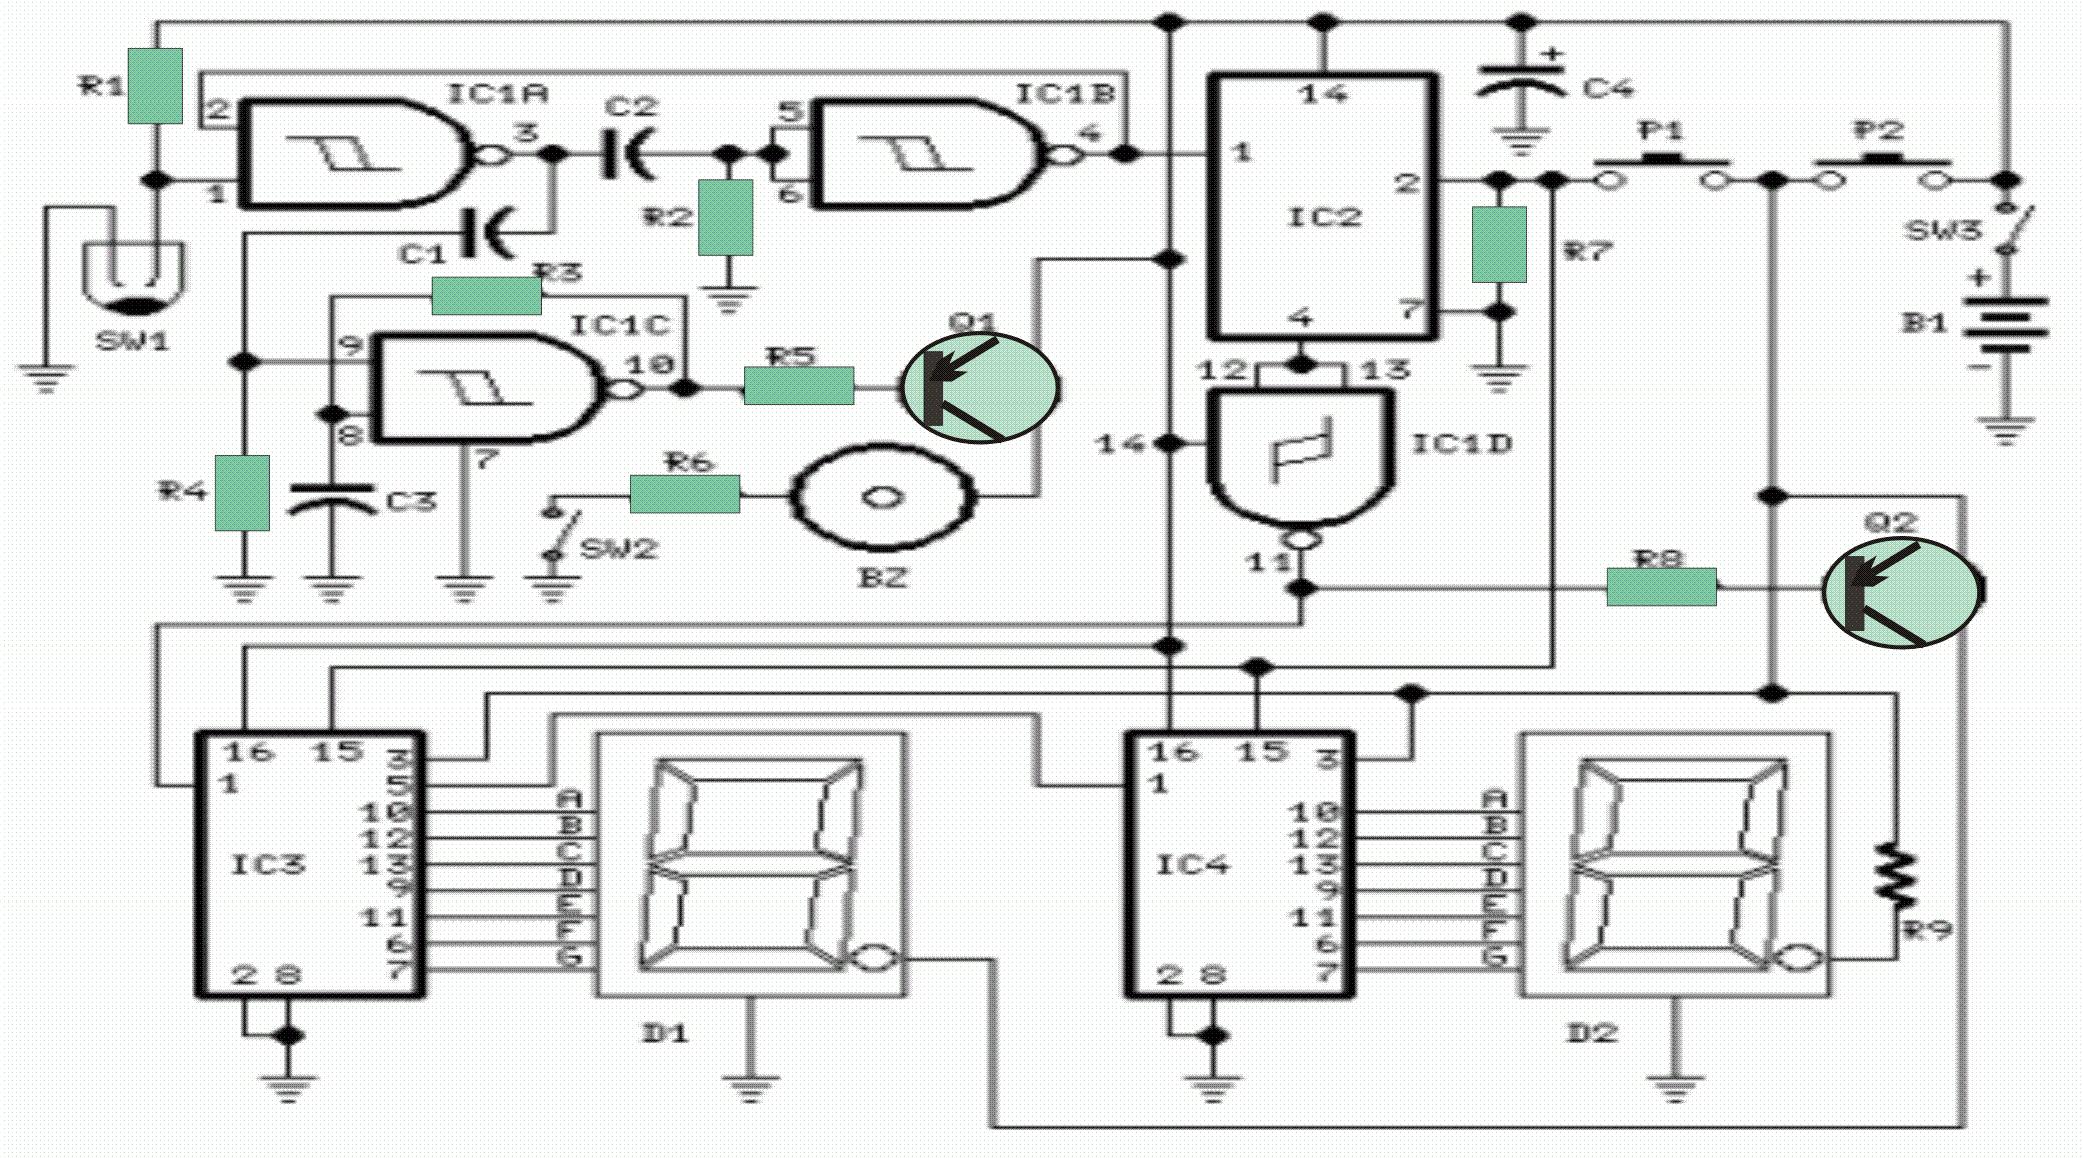 walking distance counter circuit